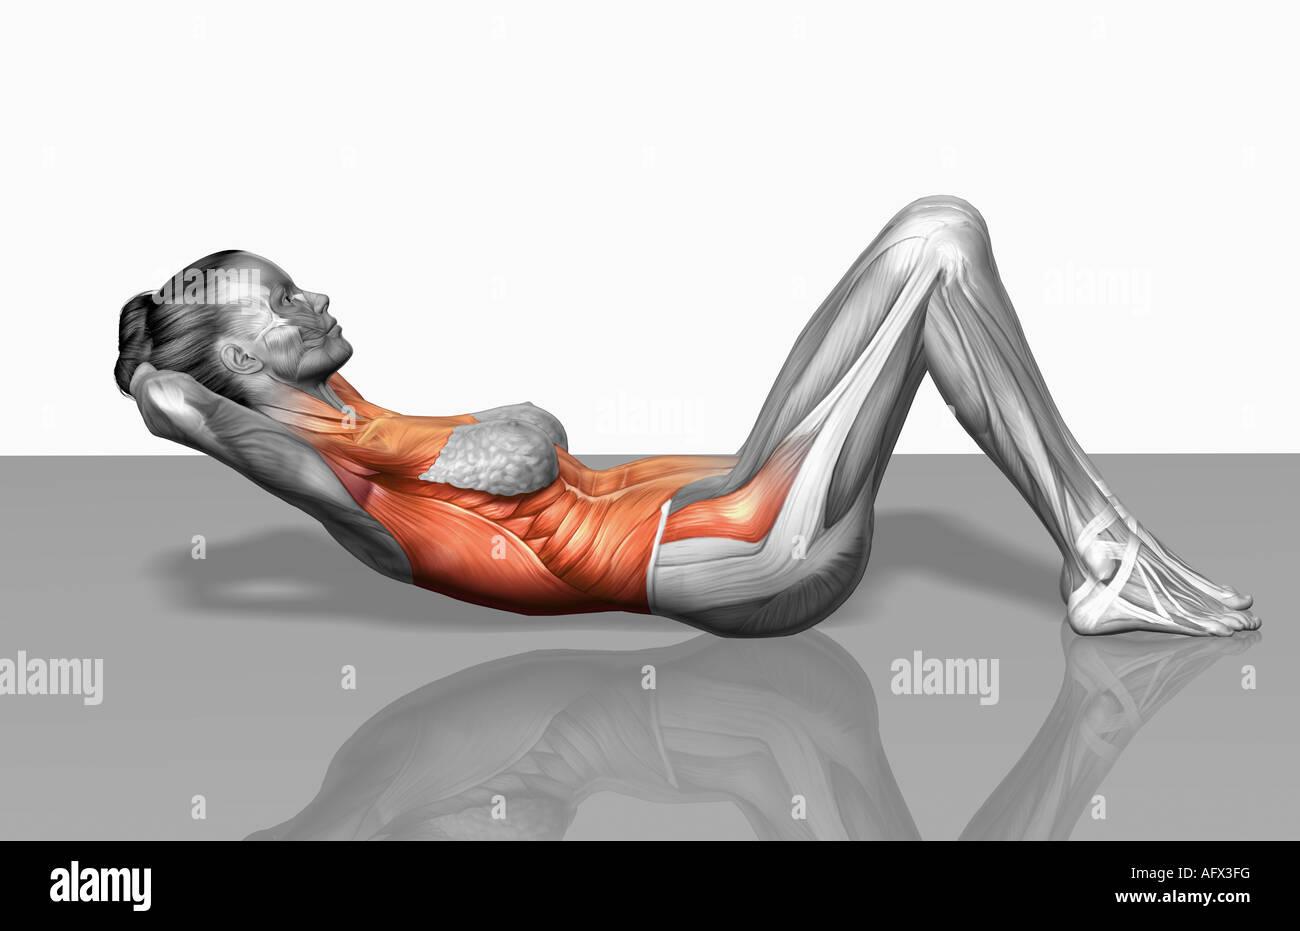 Exercices De Crunch Partie 1 De 2 Photo Stock Alamy